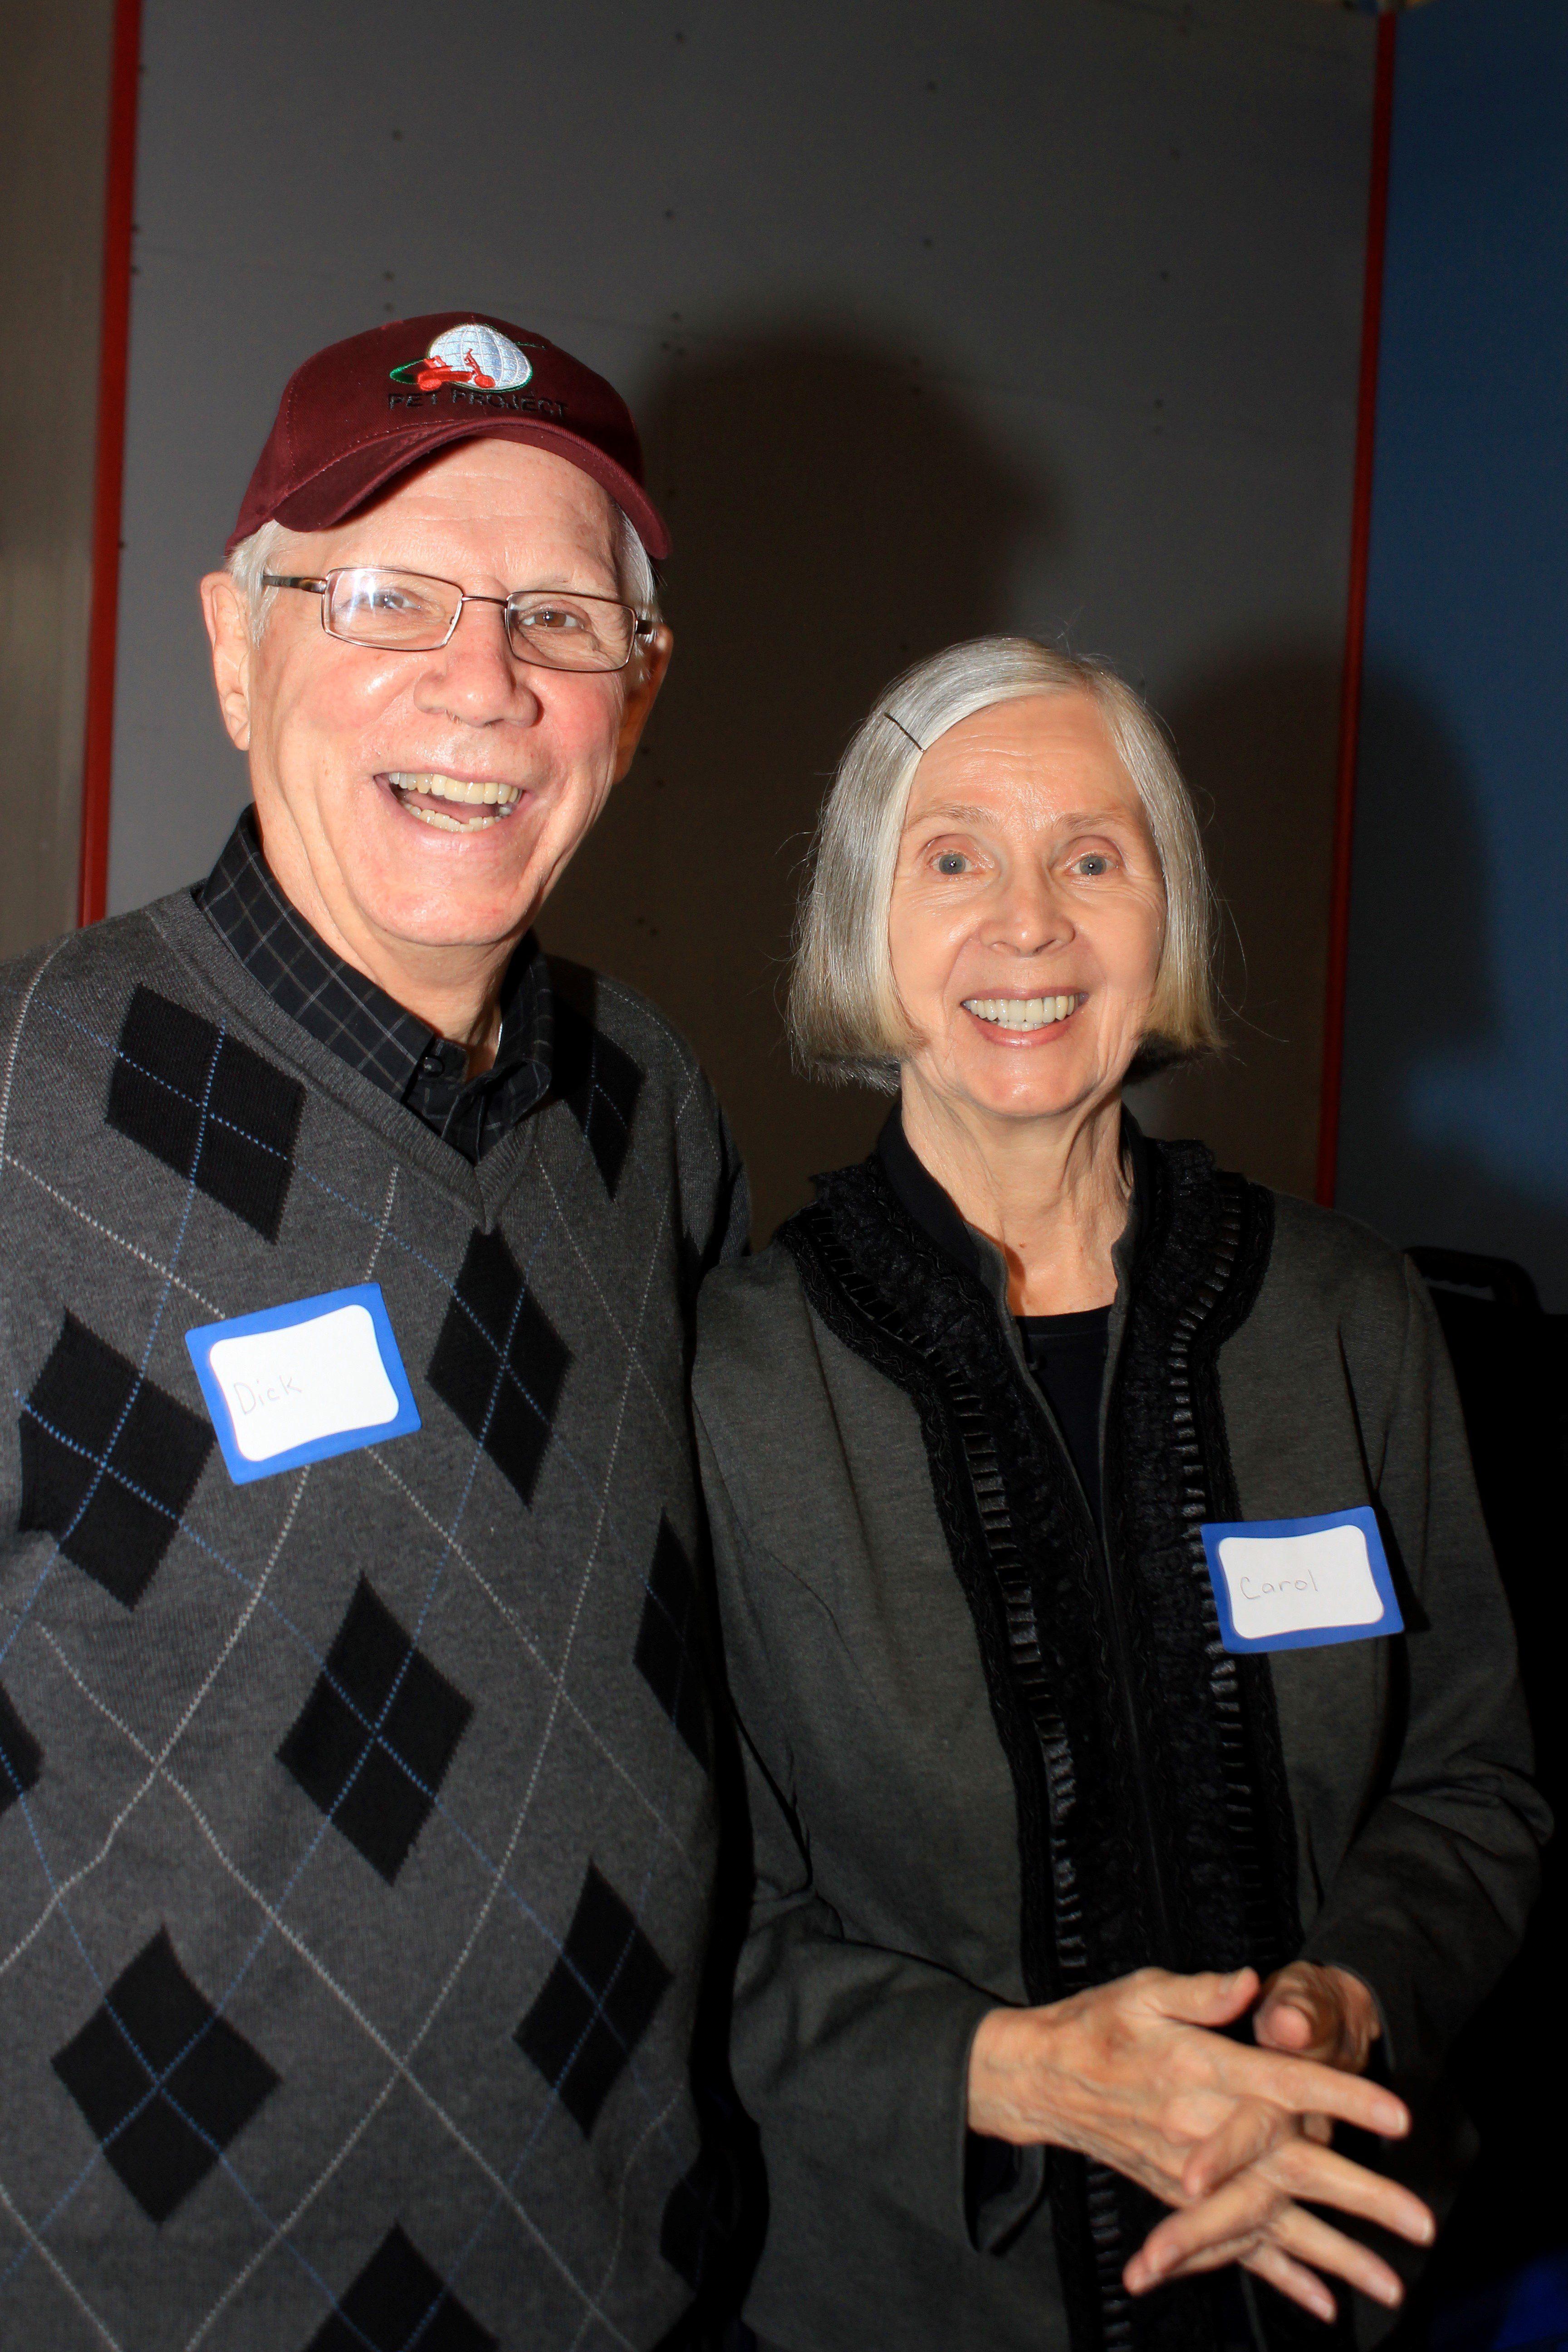 Dick and Carol Heasley